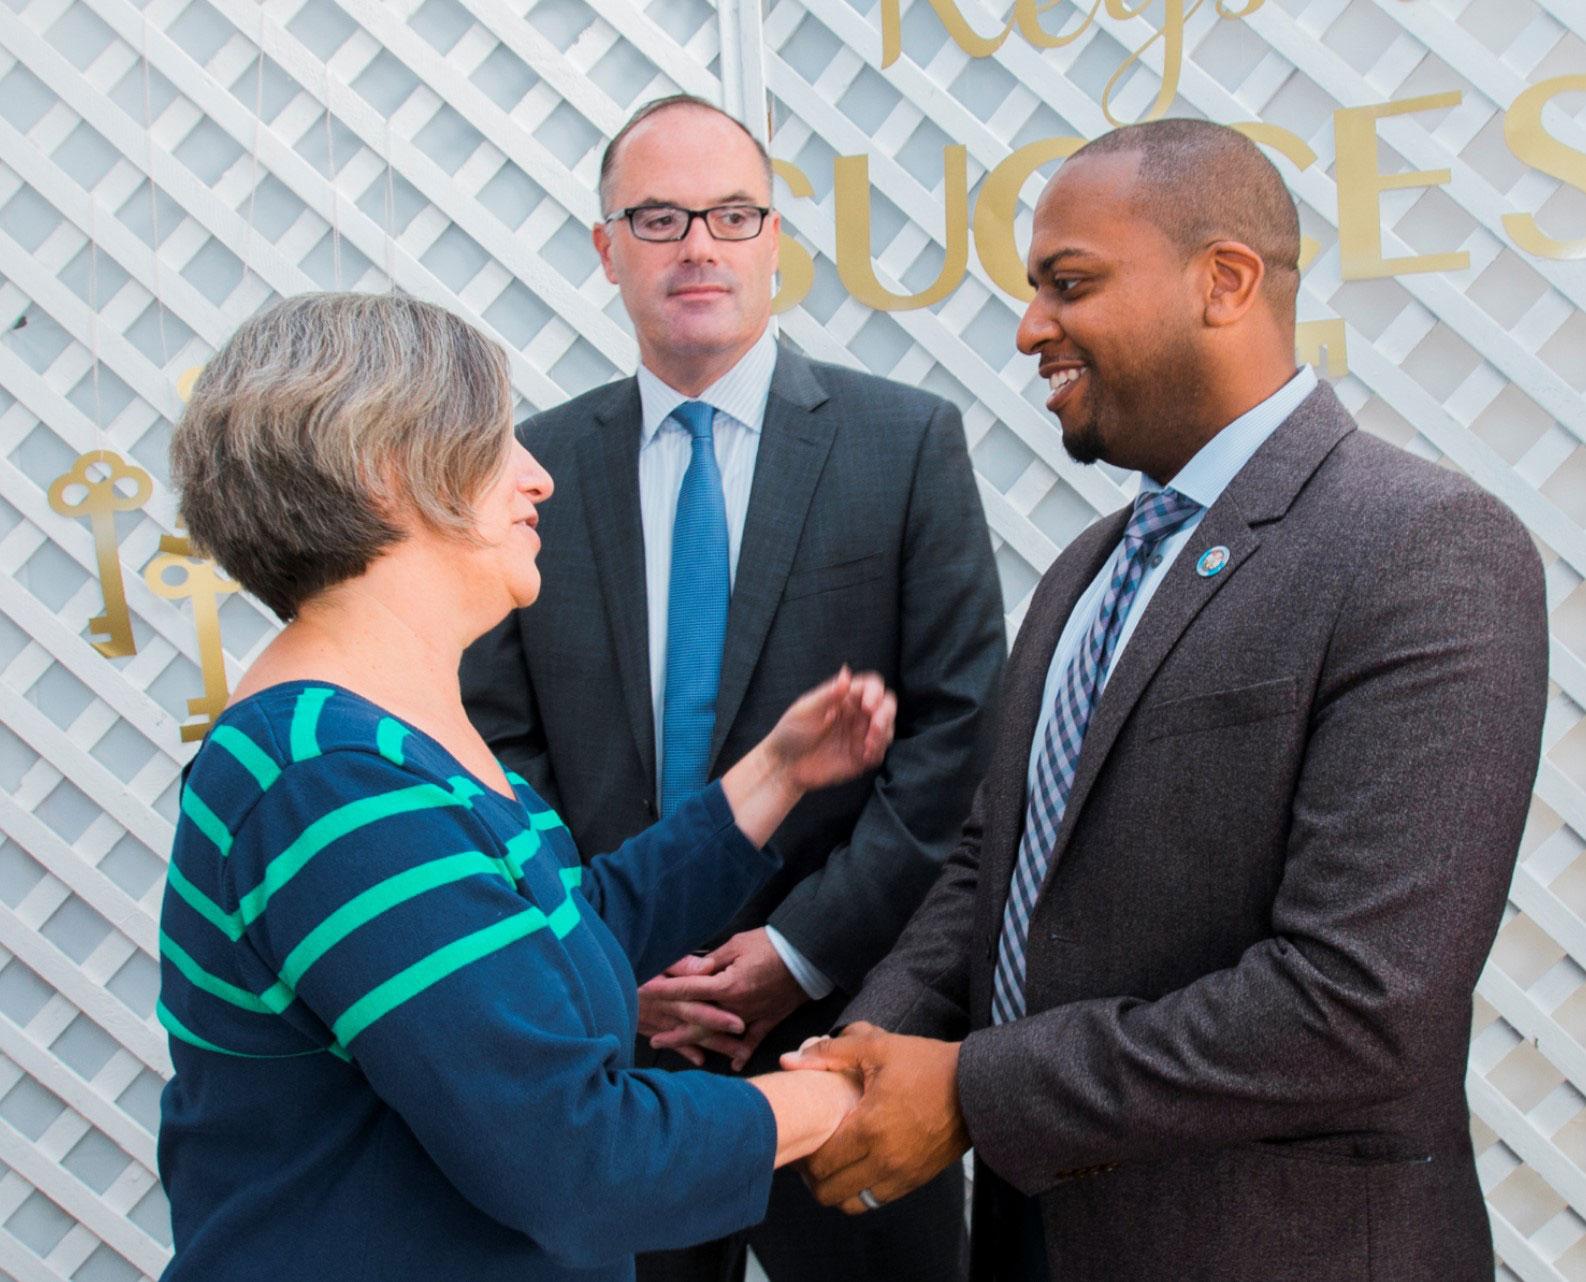 Administrative Internship program members shaking hands